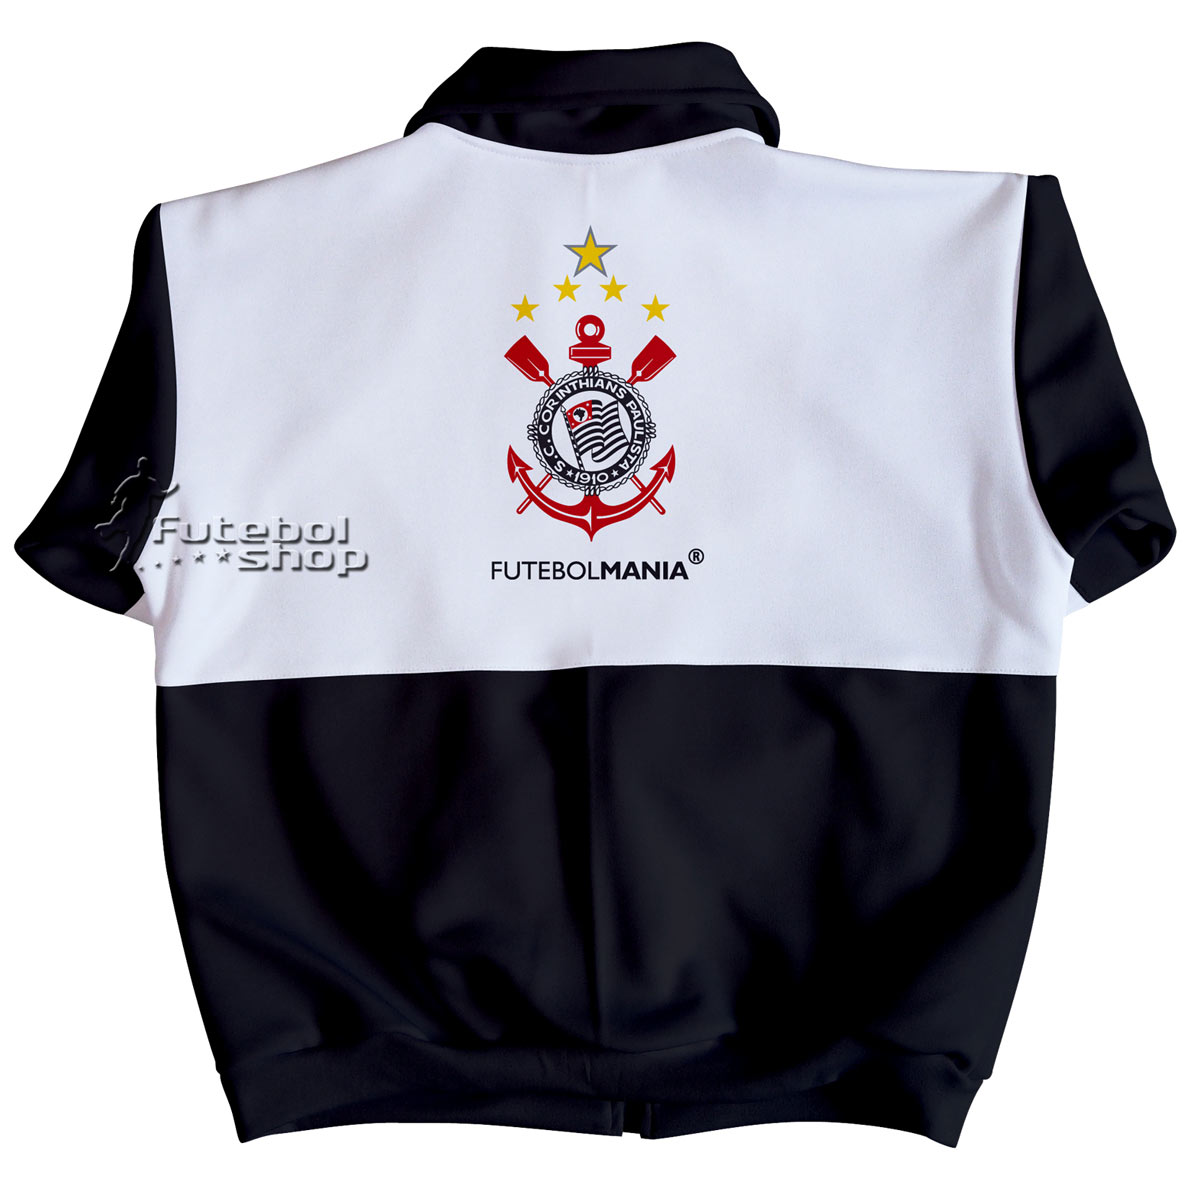 Jaqueta Teen do Corinthians de Malha Esportiva - 224B